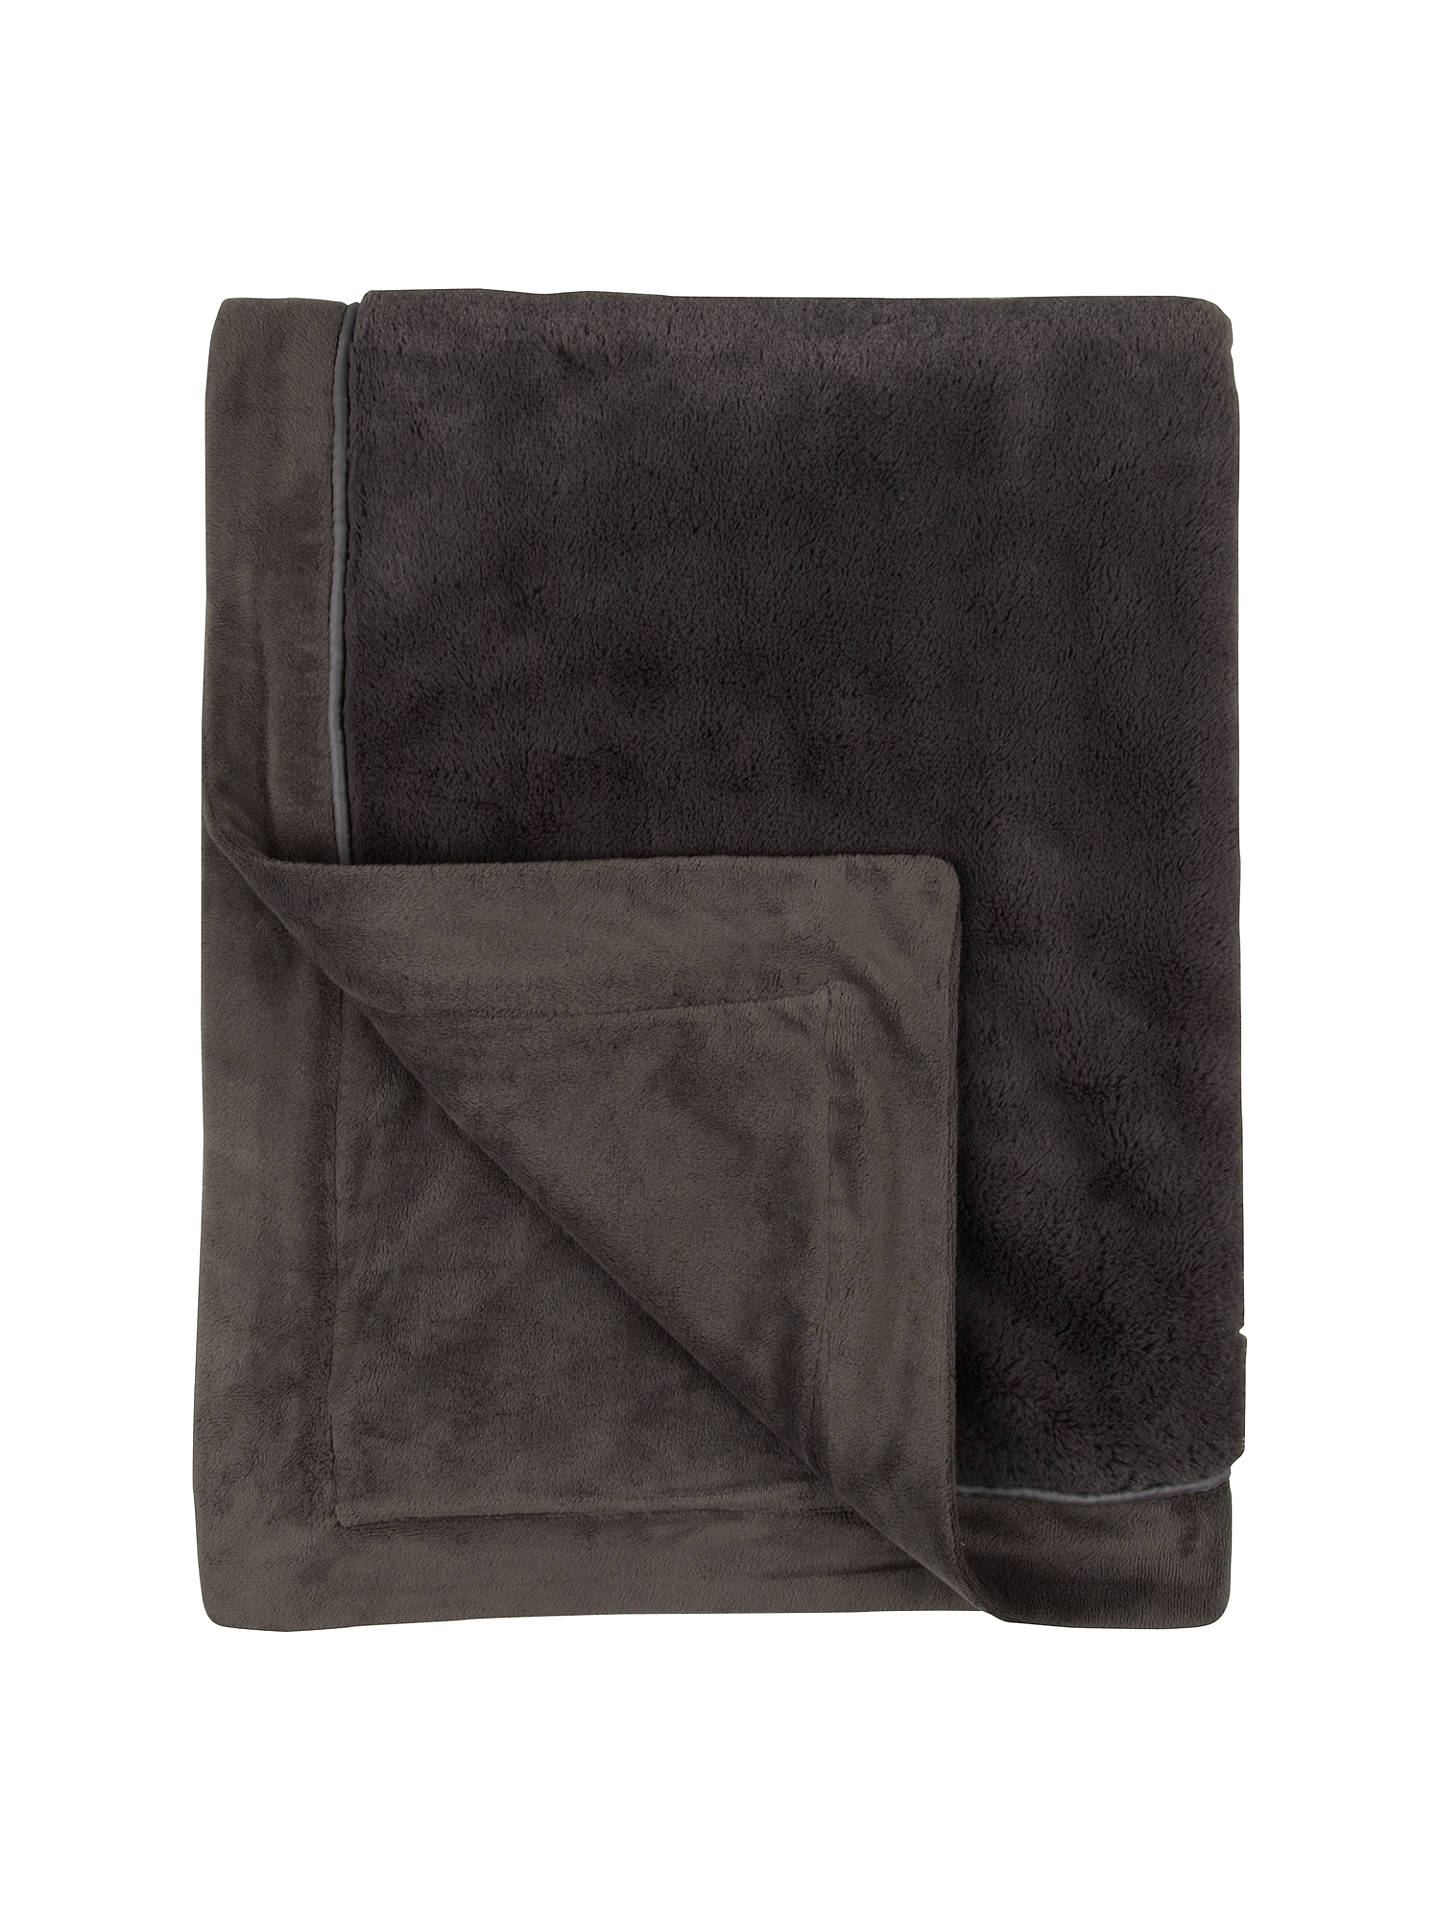 john lewis luxury fleece throw at john lewis partners. Black Bedroom Furniture Sets. Home Design Ideas